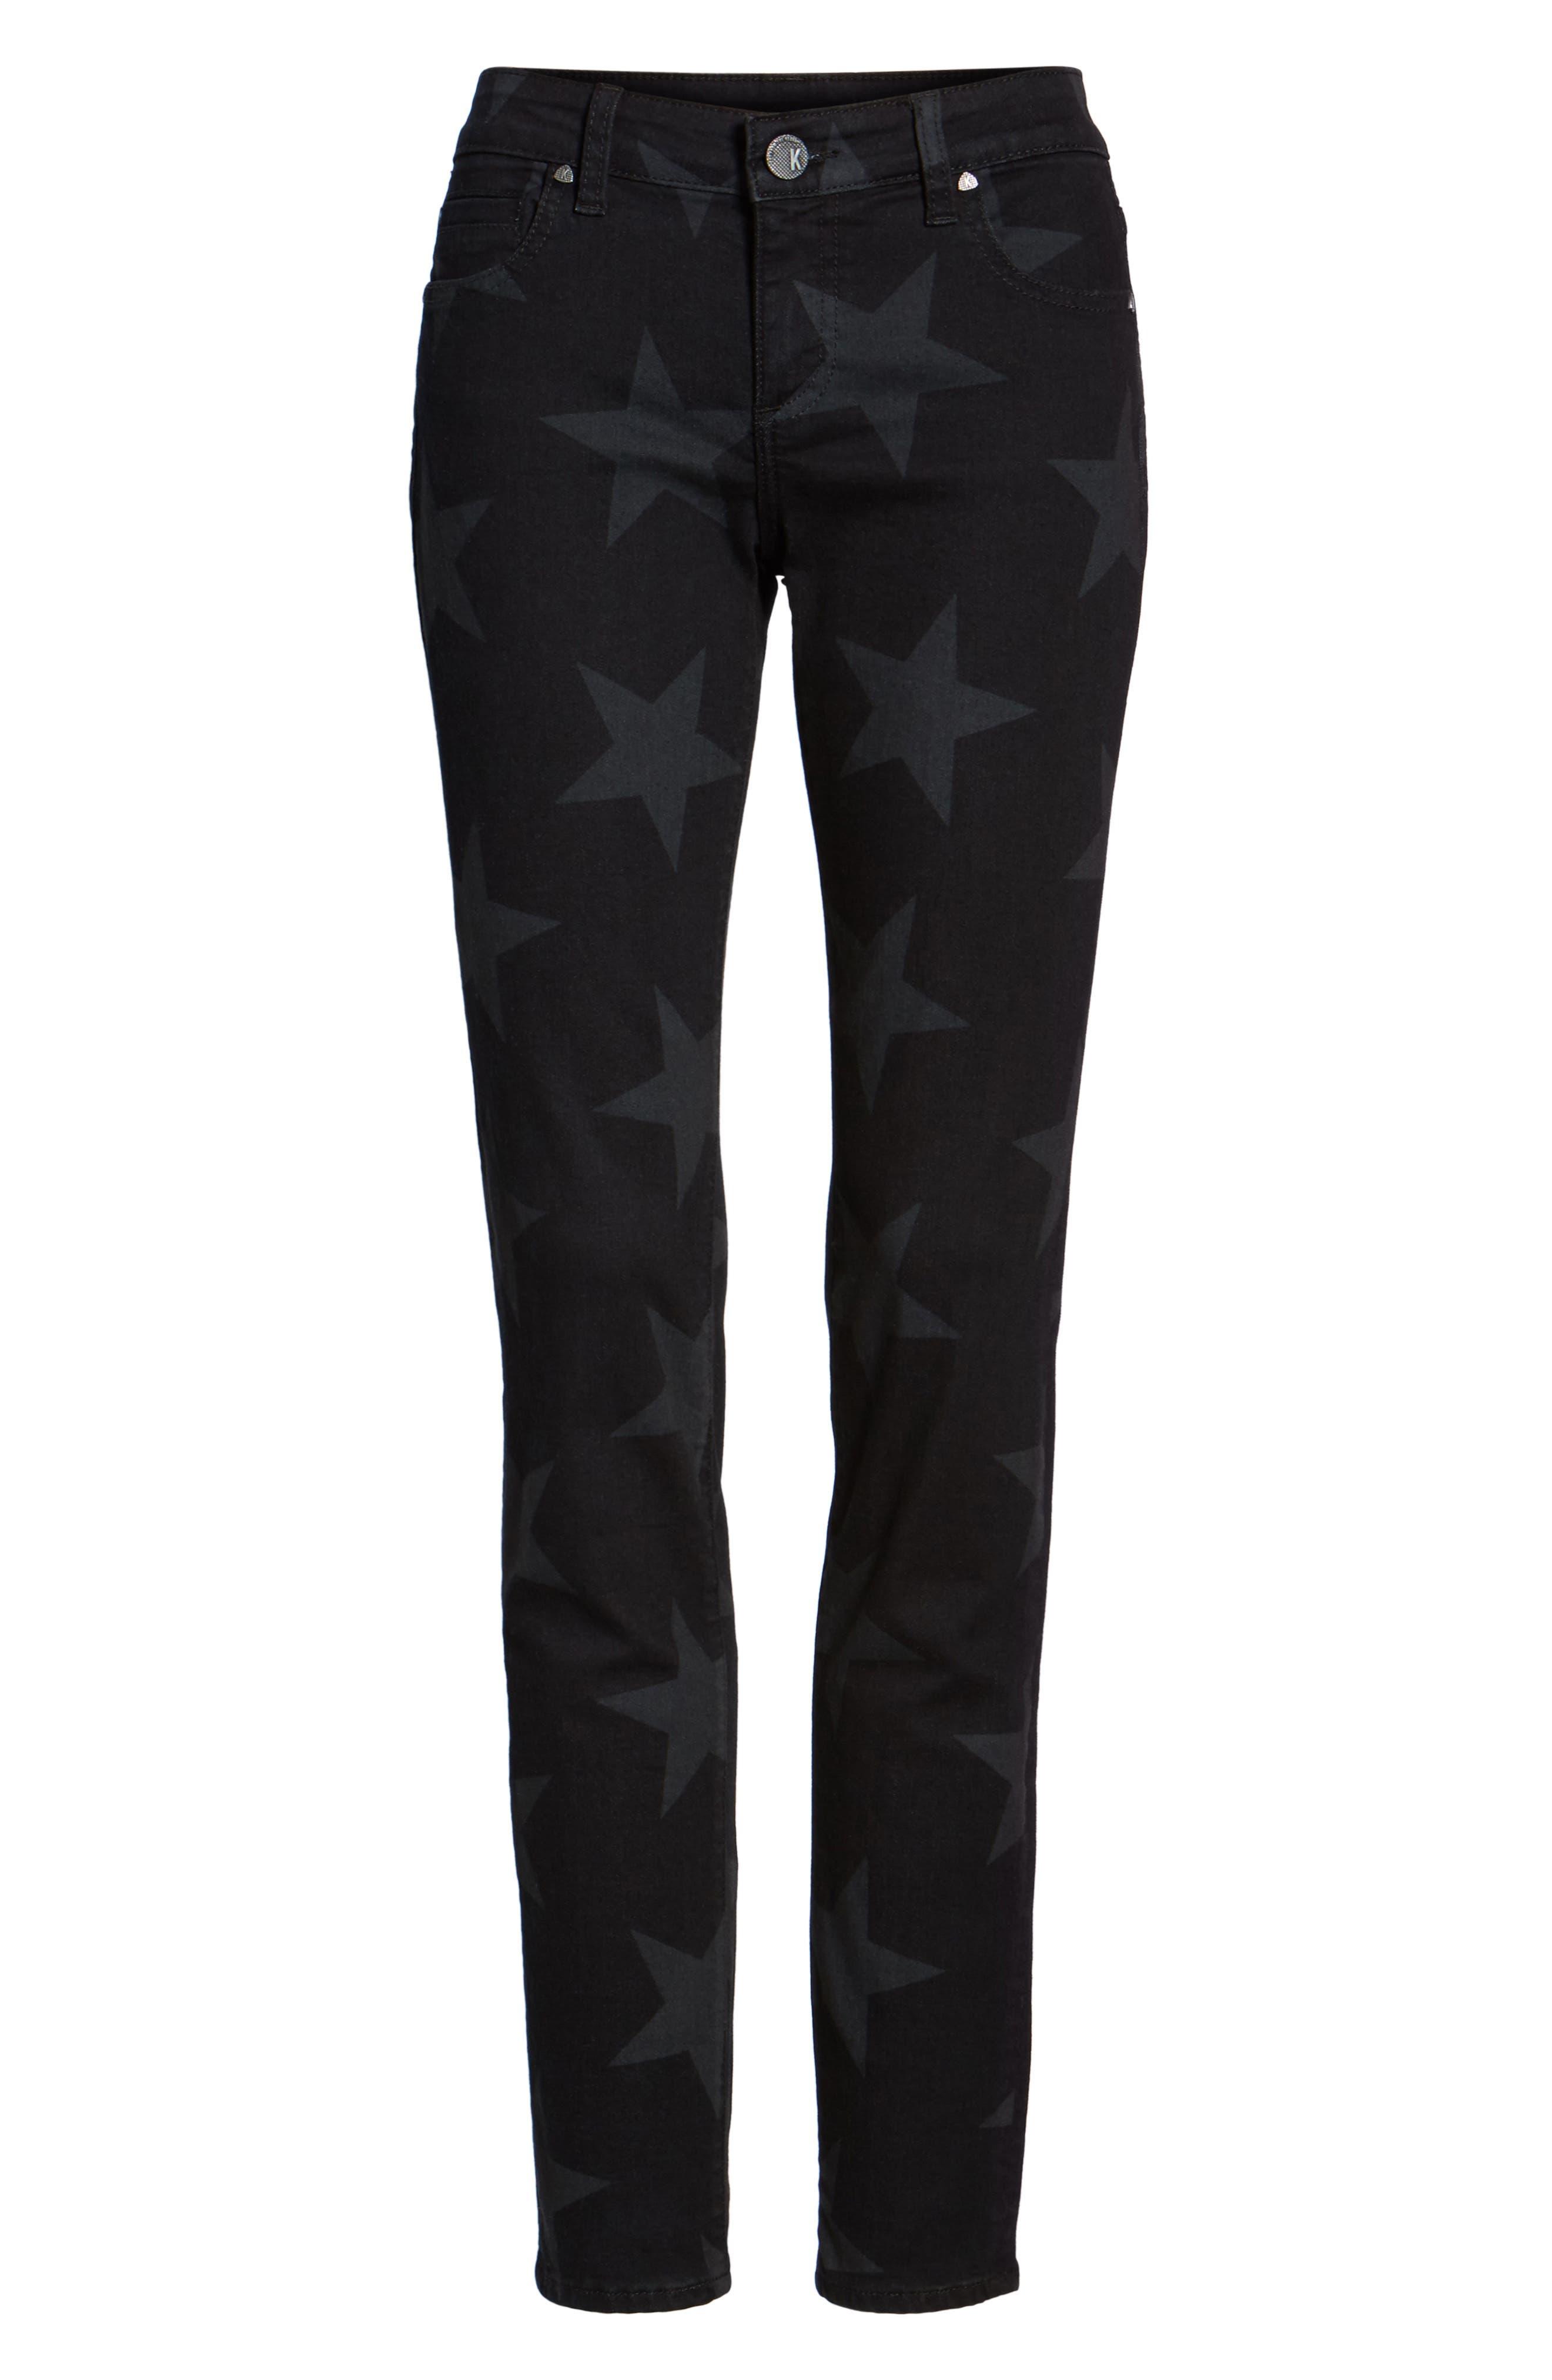 Mia Star Print Skinny Jeans,                             Alternate thumbnail 6, color,                             Trailblazing